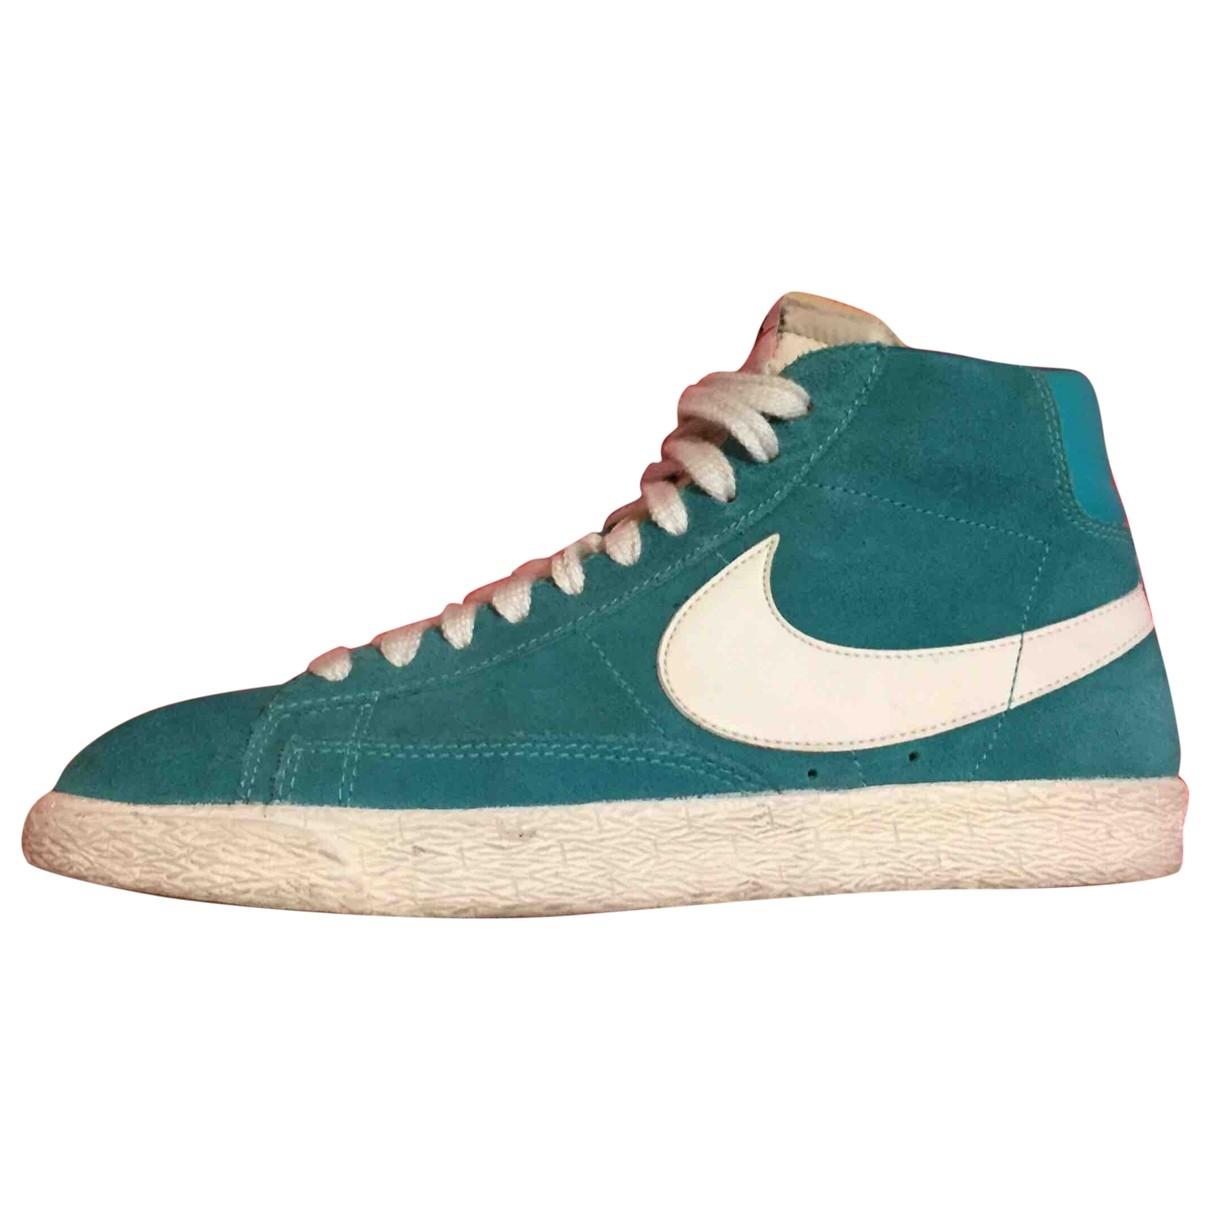 Nike - Baskets Blazer pour femme en suede - turquoise